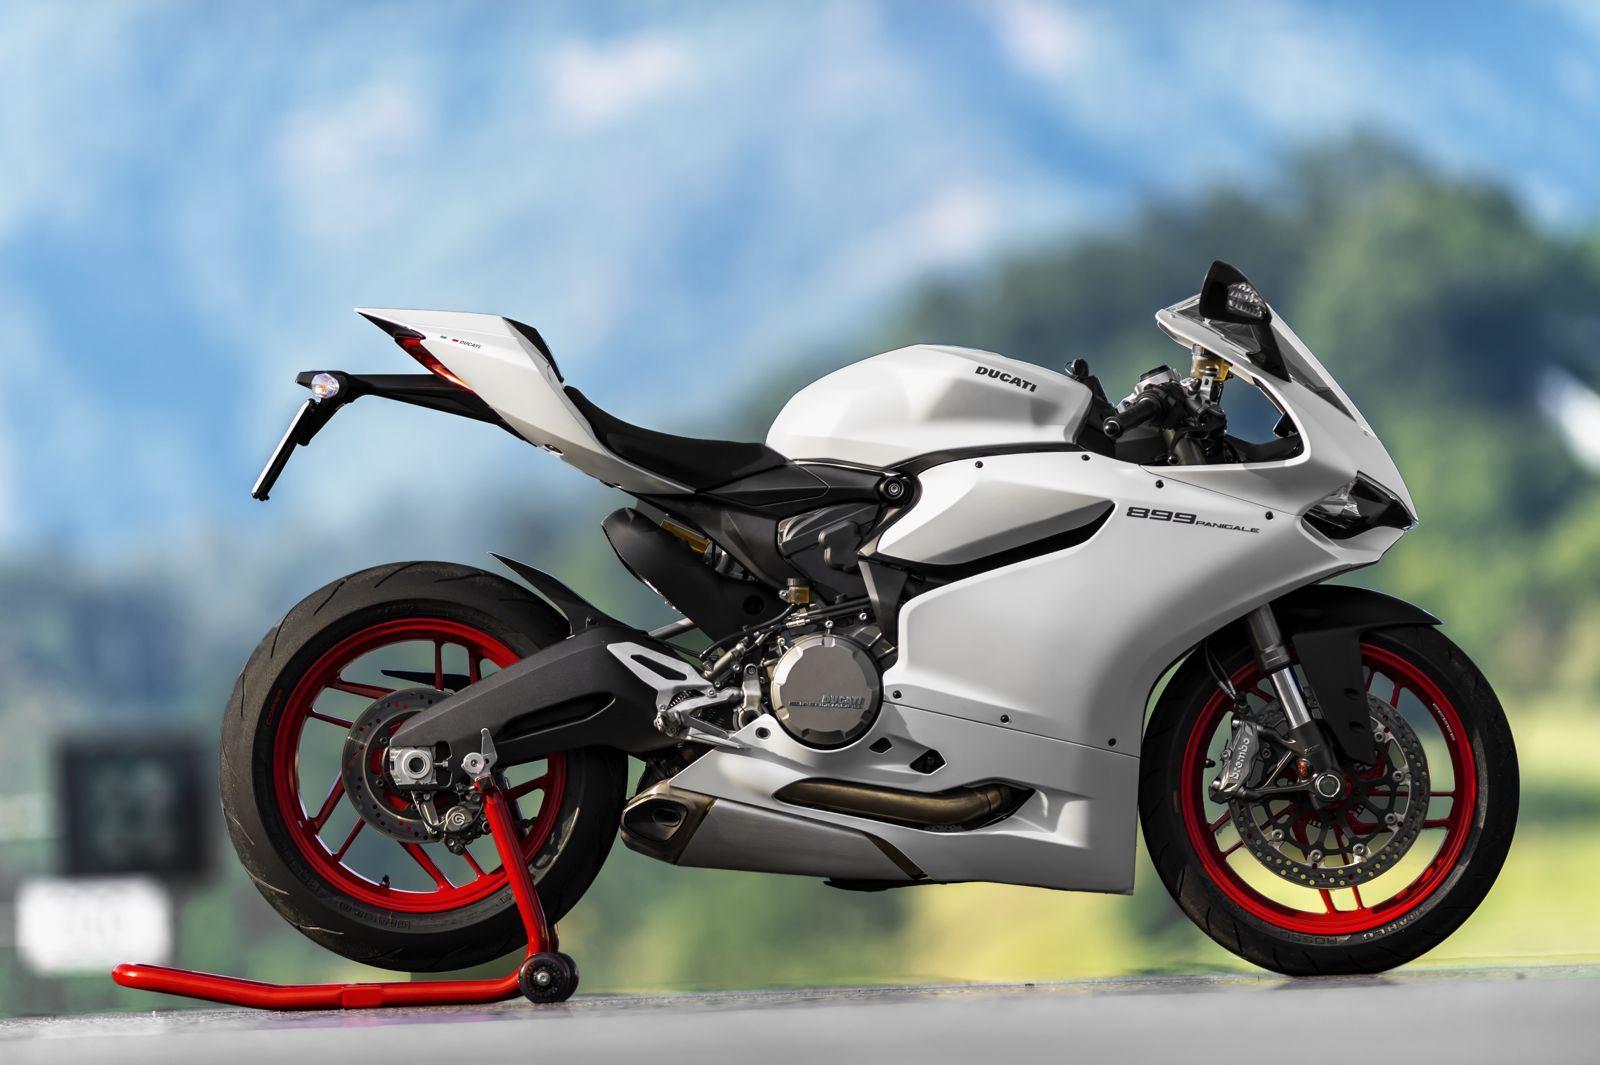 Ducati-899-Panigale-024